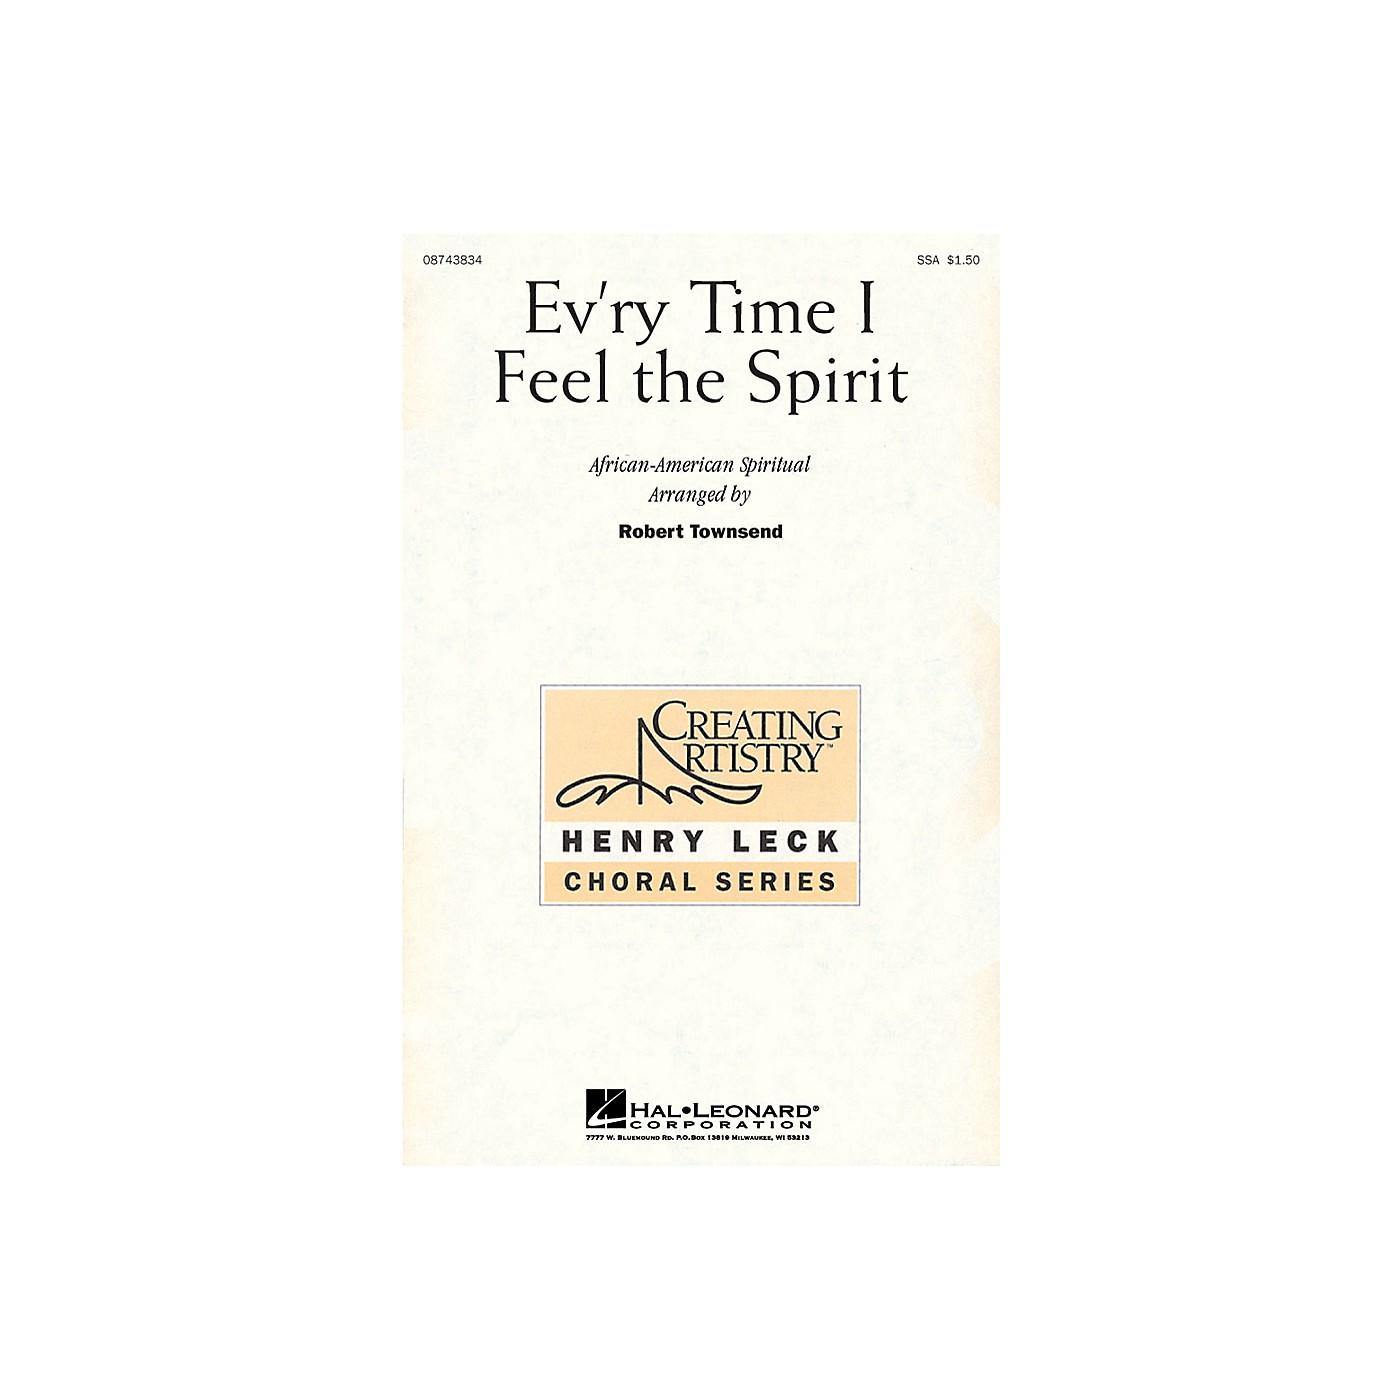 Hal Leonard Ev'ry Time I Feel the Spirit SSA arranged by Robert Townsend thumbnail